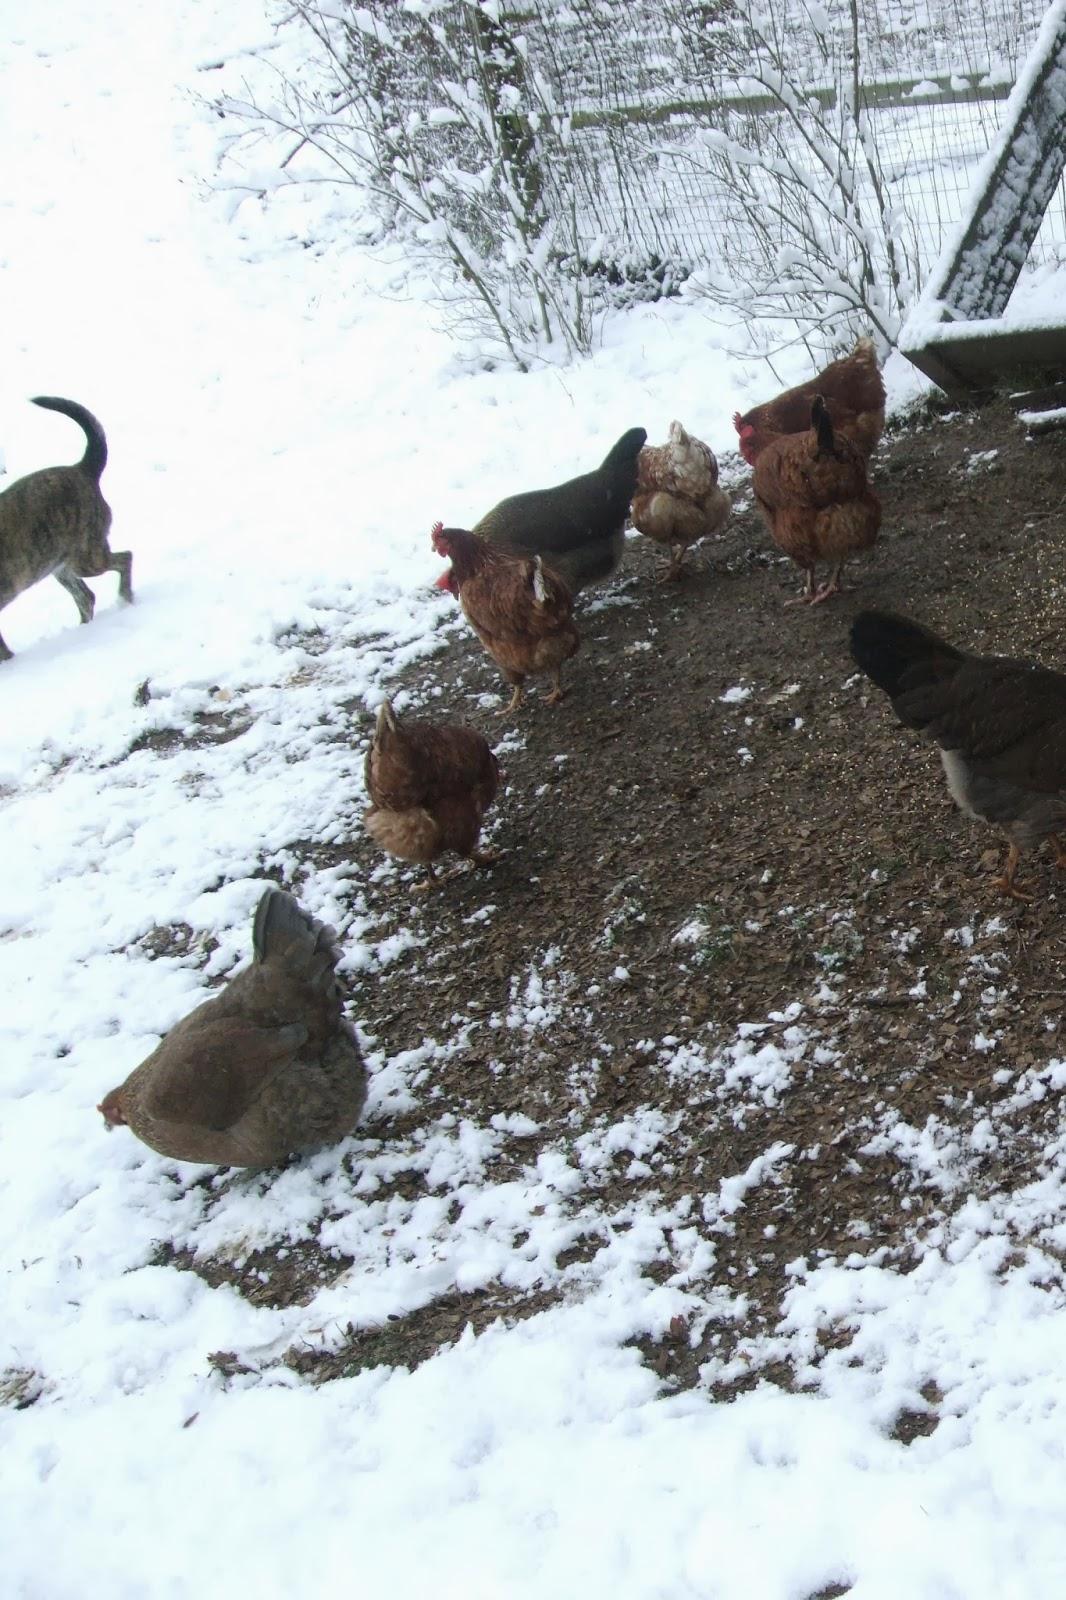 Pam's Backyard Chickens: 5 Tips to Help Your Backyard ...